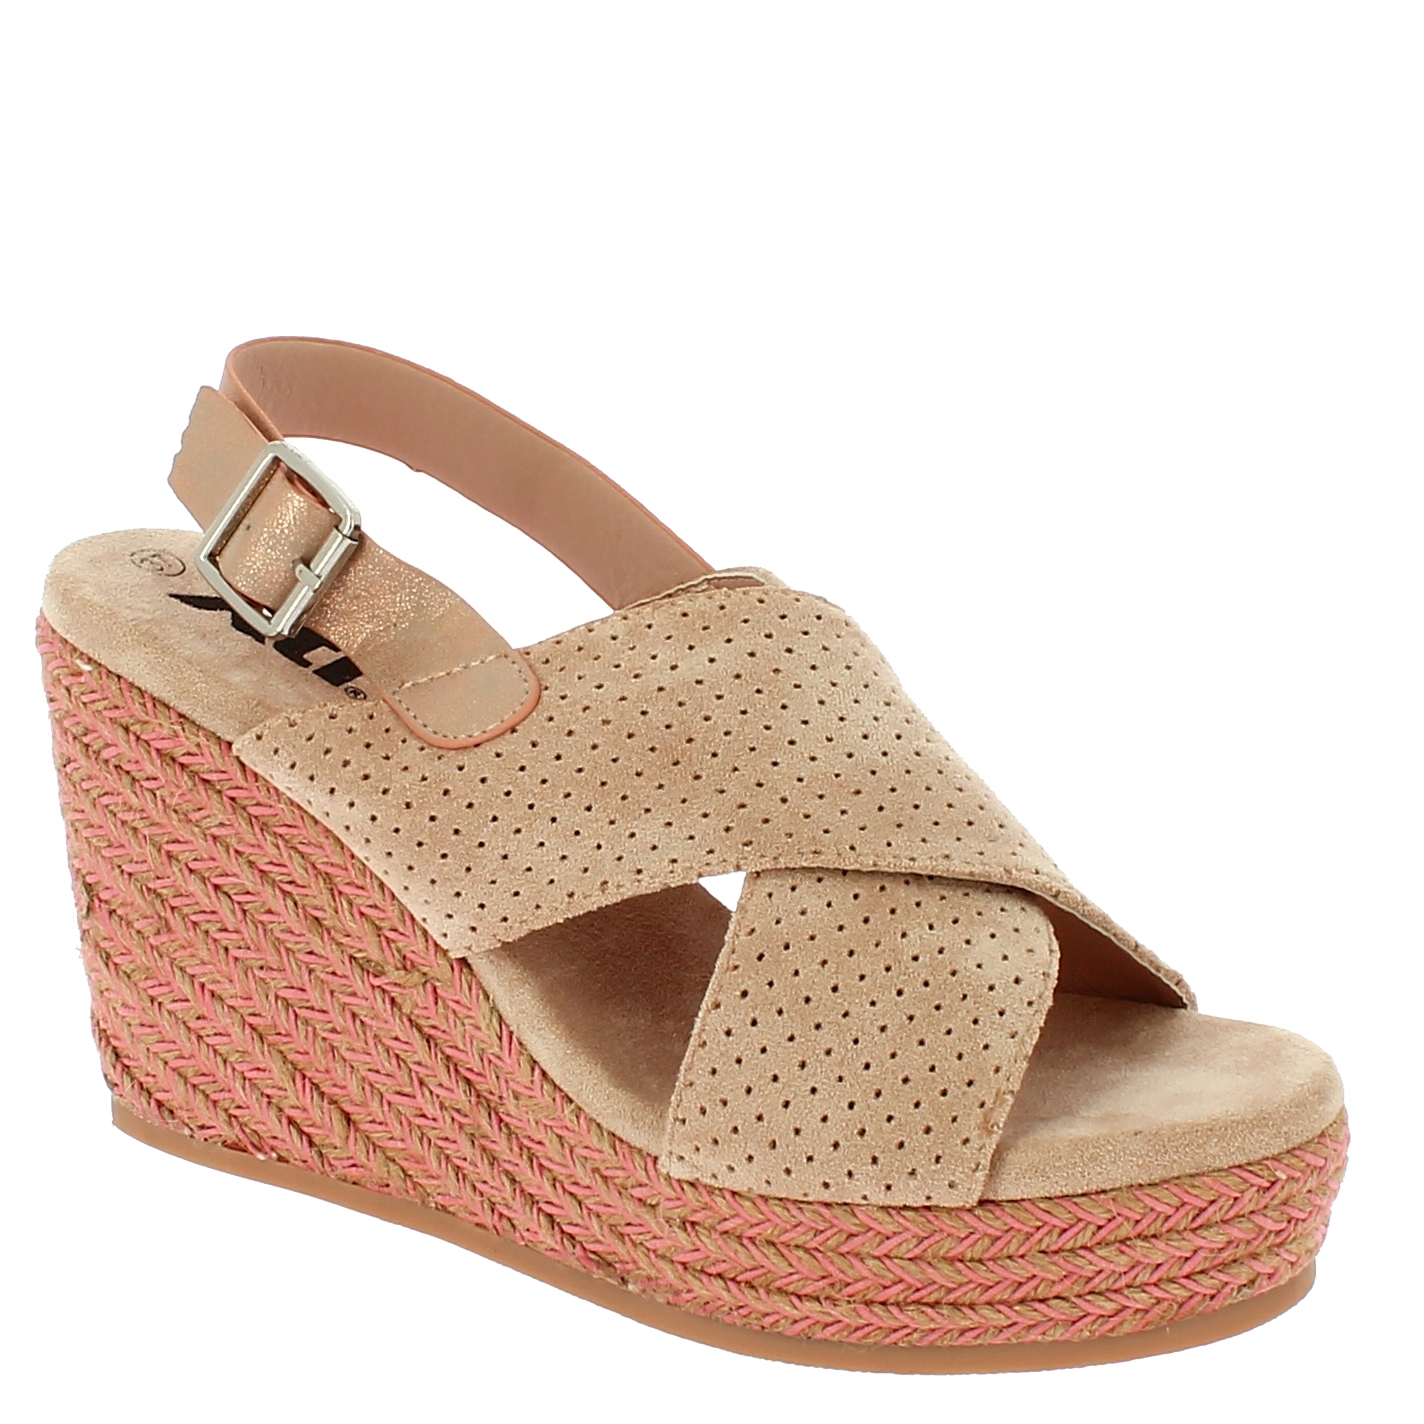 XTI Γυναικεία Πλατφόρμα 49088 Μπεζ - XTI - 49088 NUDE-XTI-beige-36/1/7/7 παπούτσια  new in